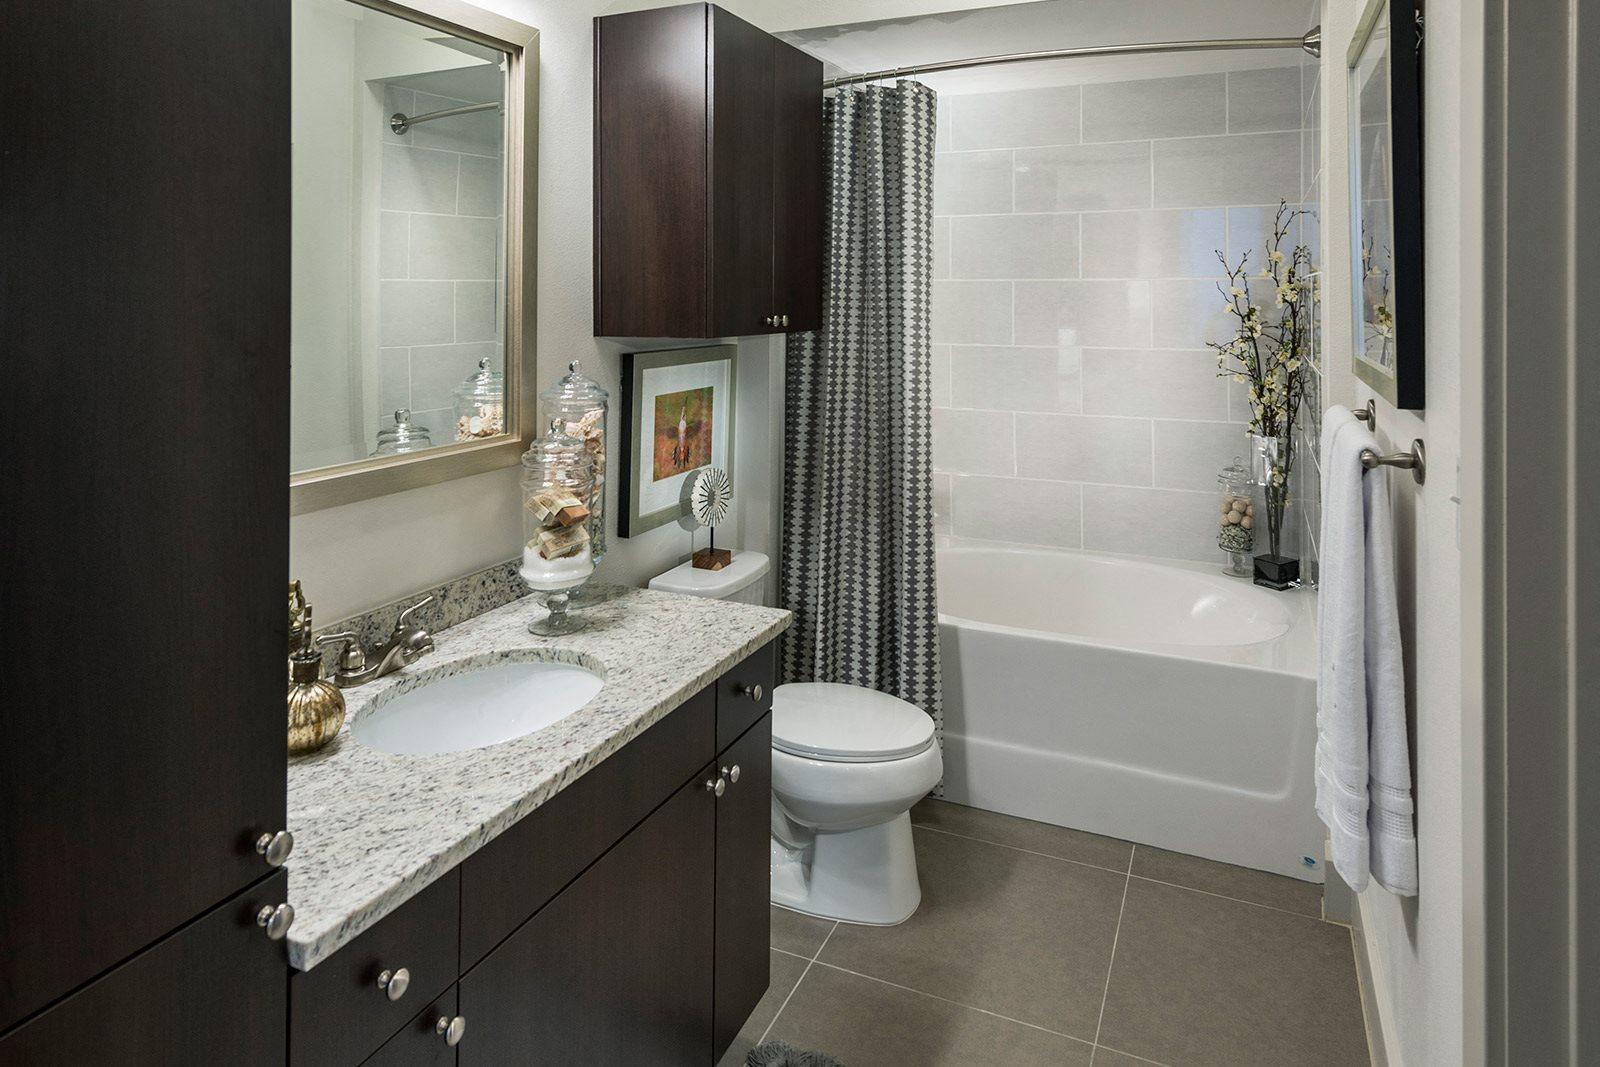 Spa-Inspired Bathrooms at Windsor Lantana Hills, 6601 Rialto Blvd, TX